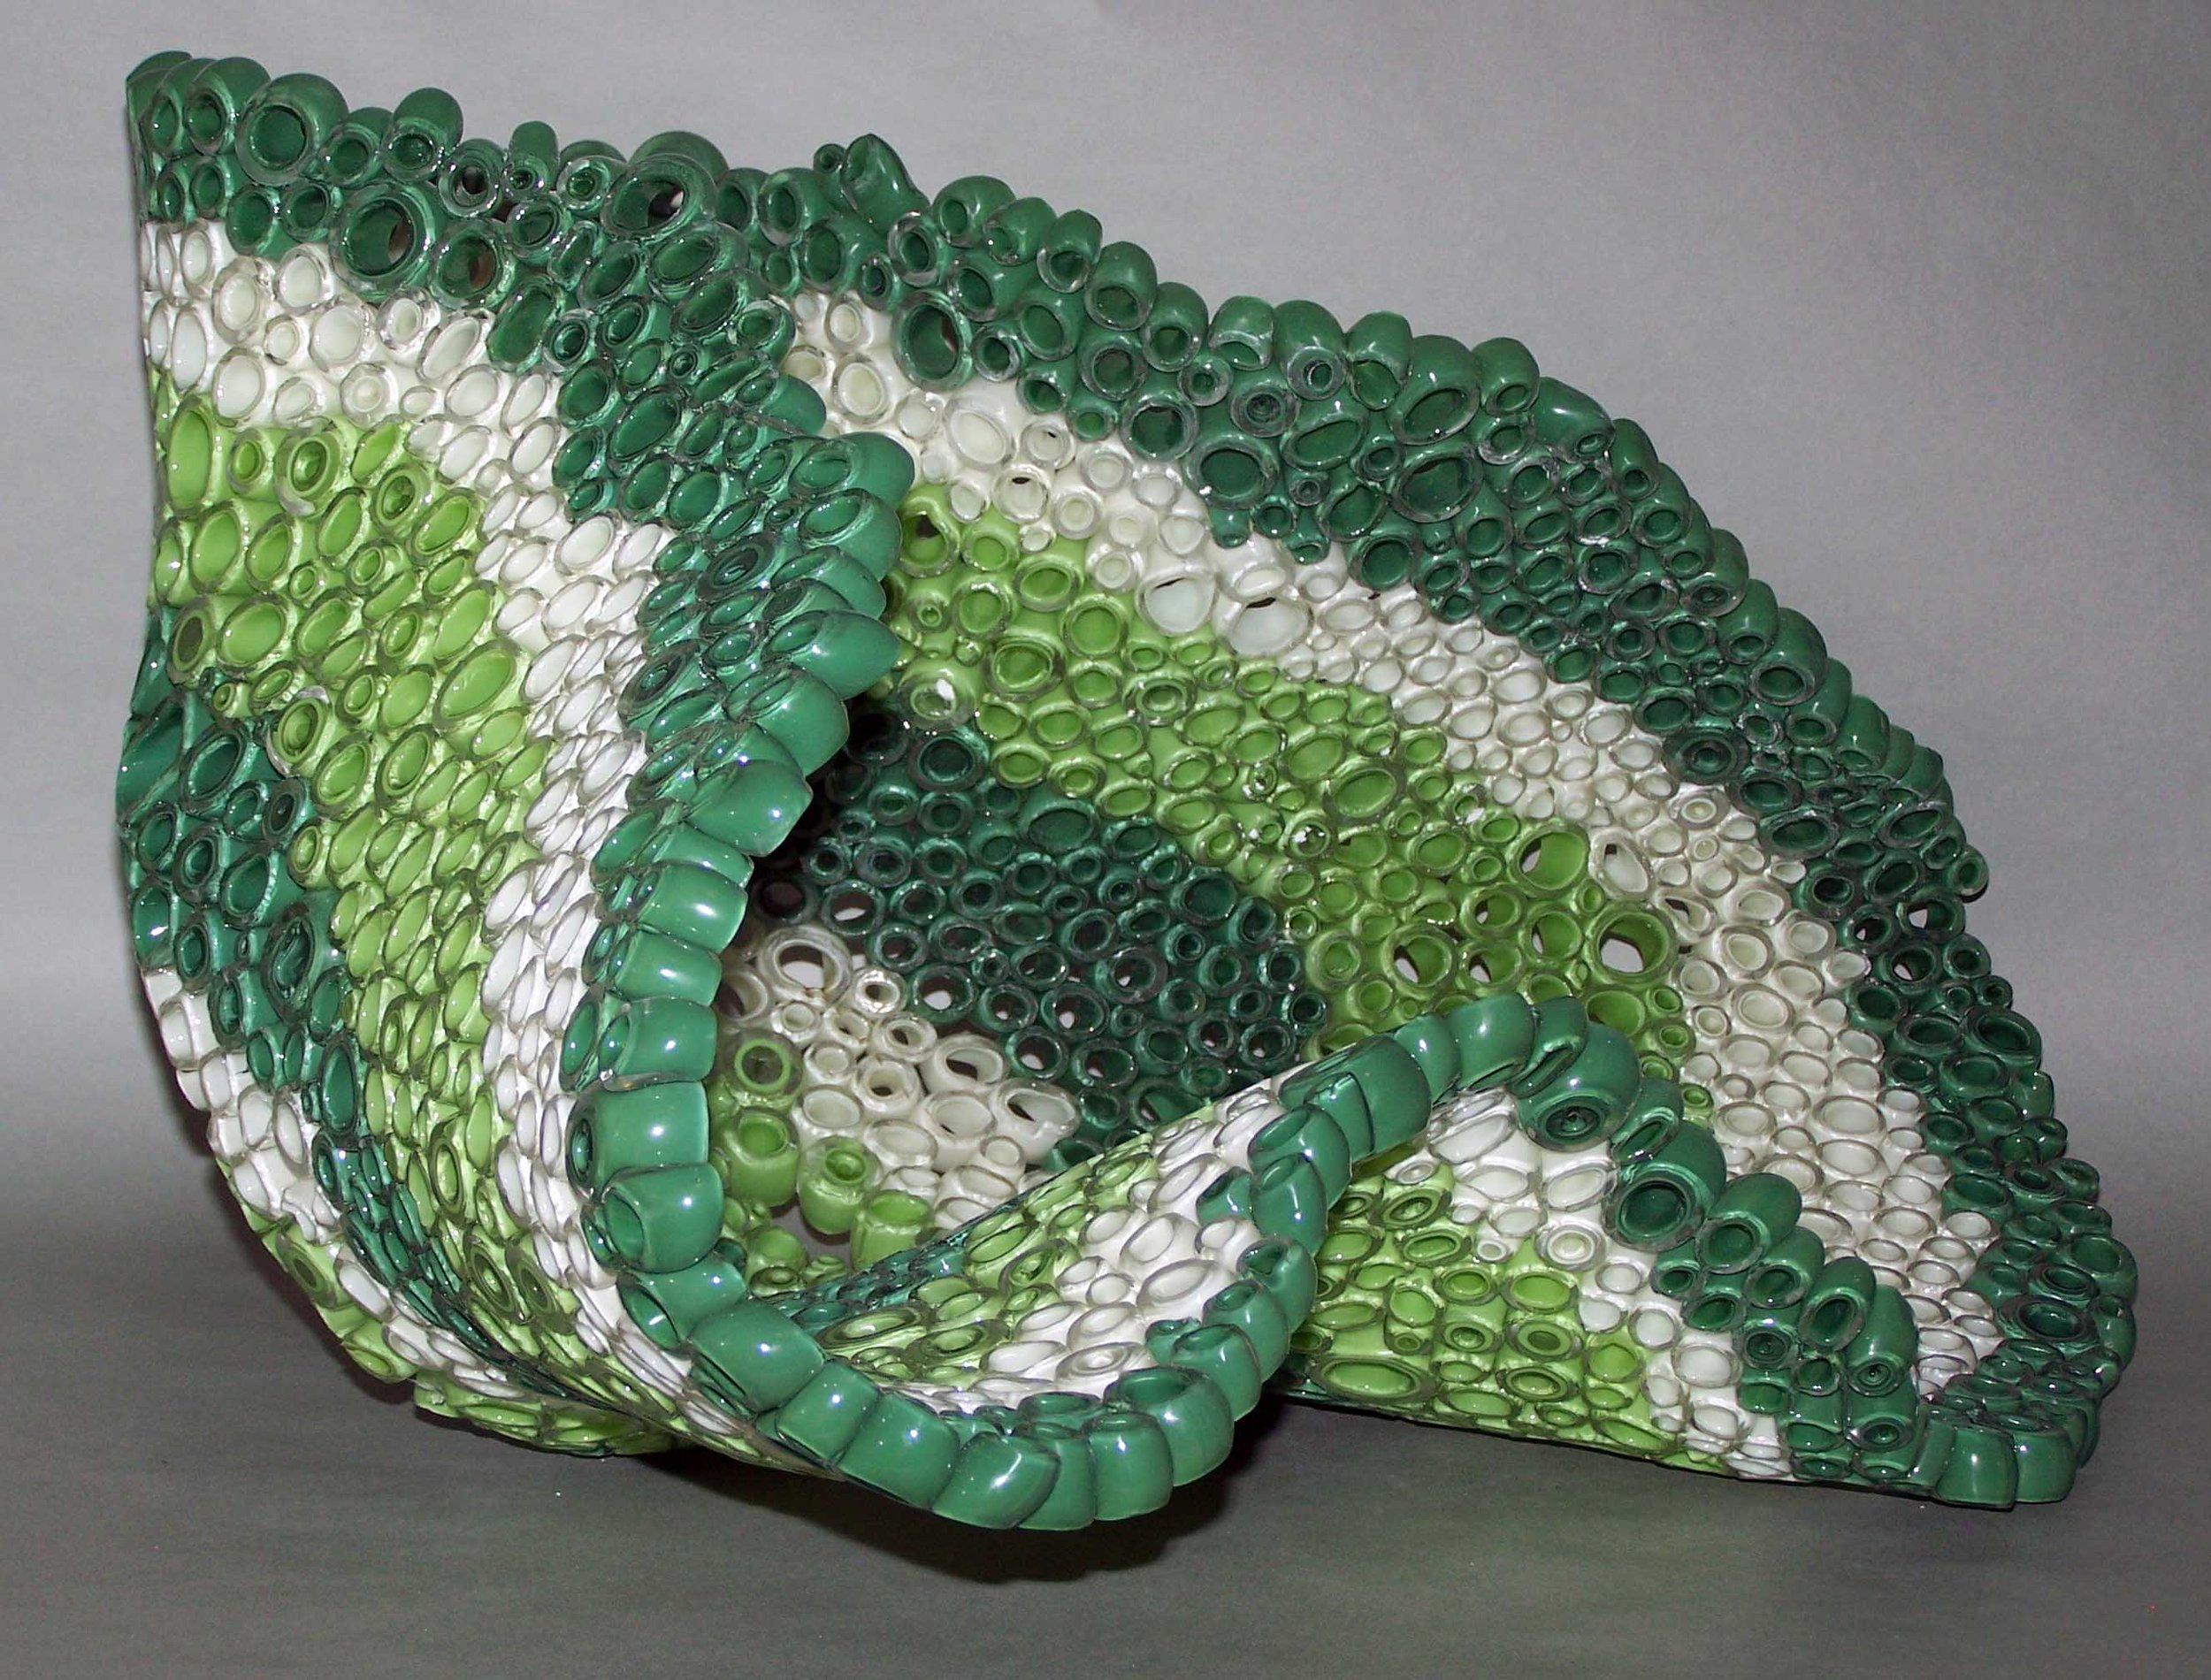 01.Green Seascape.jpg